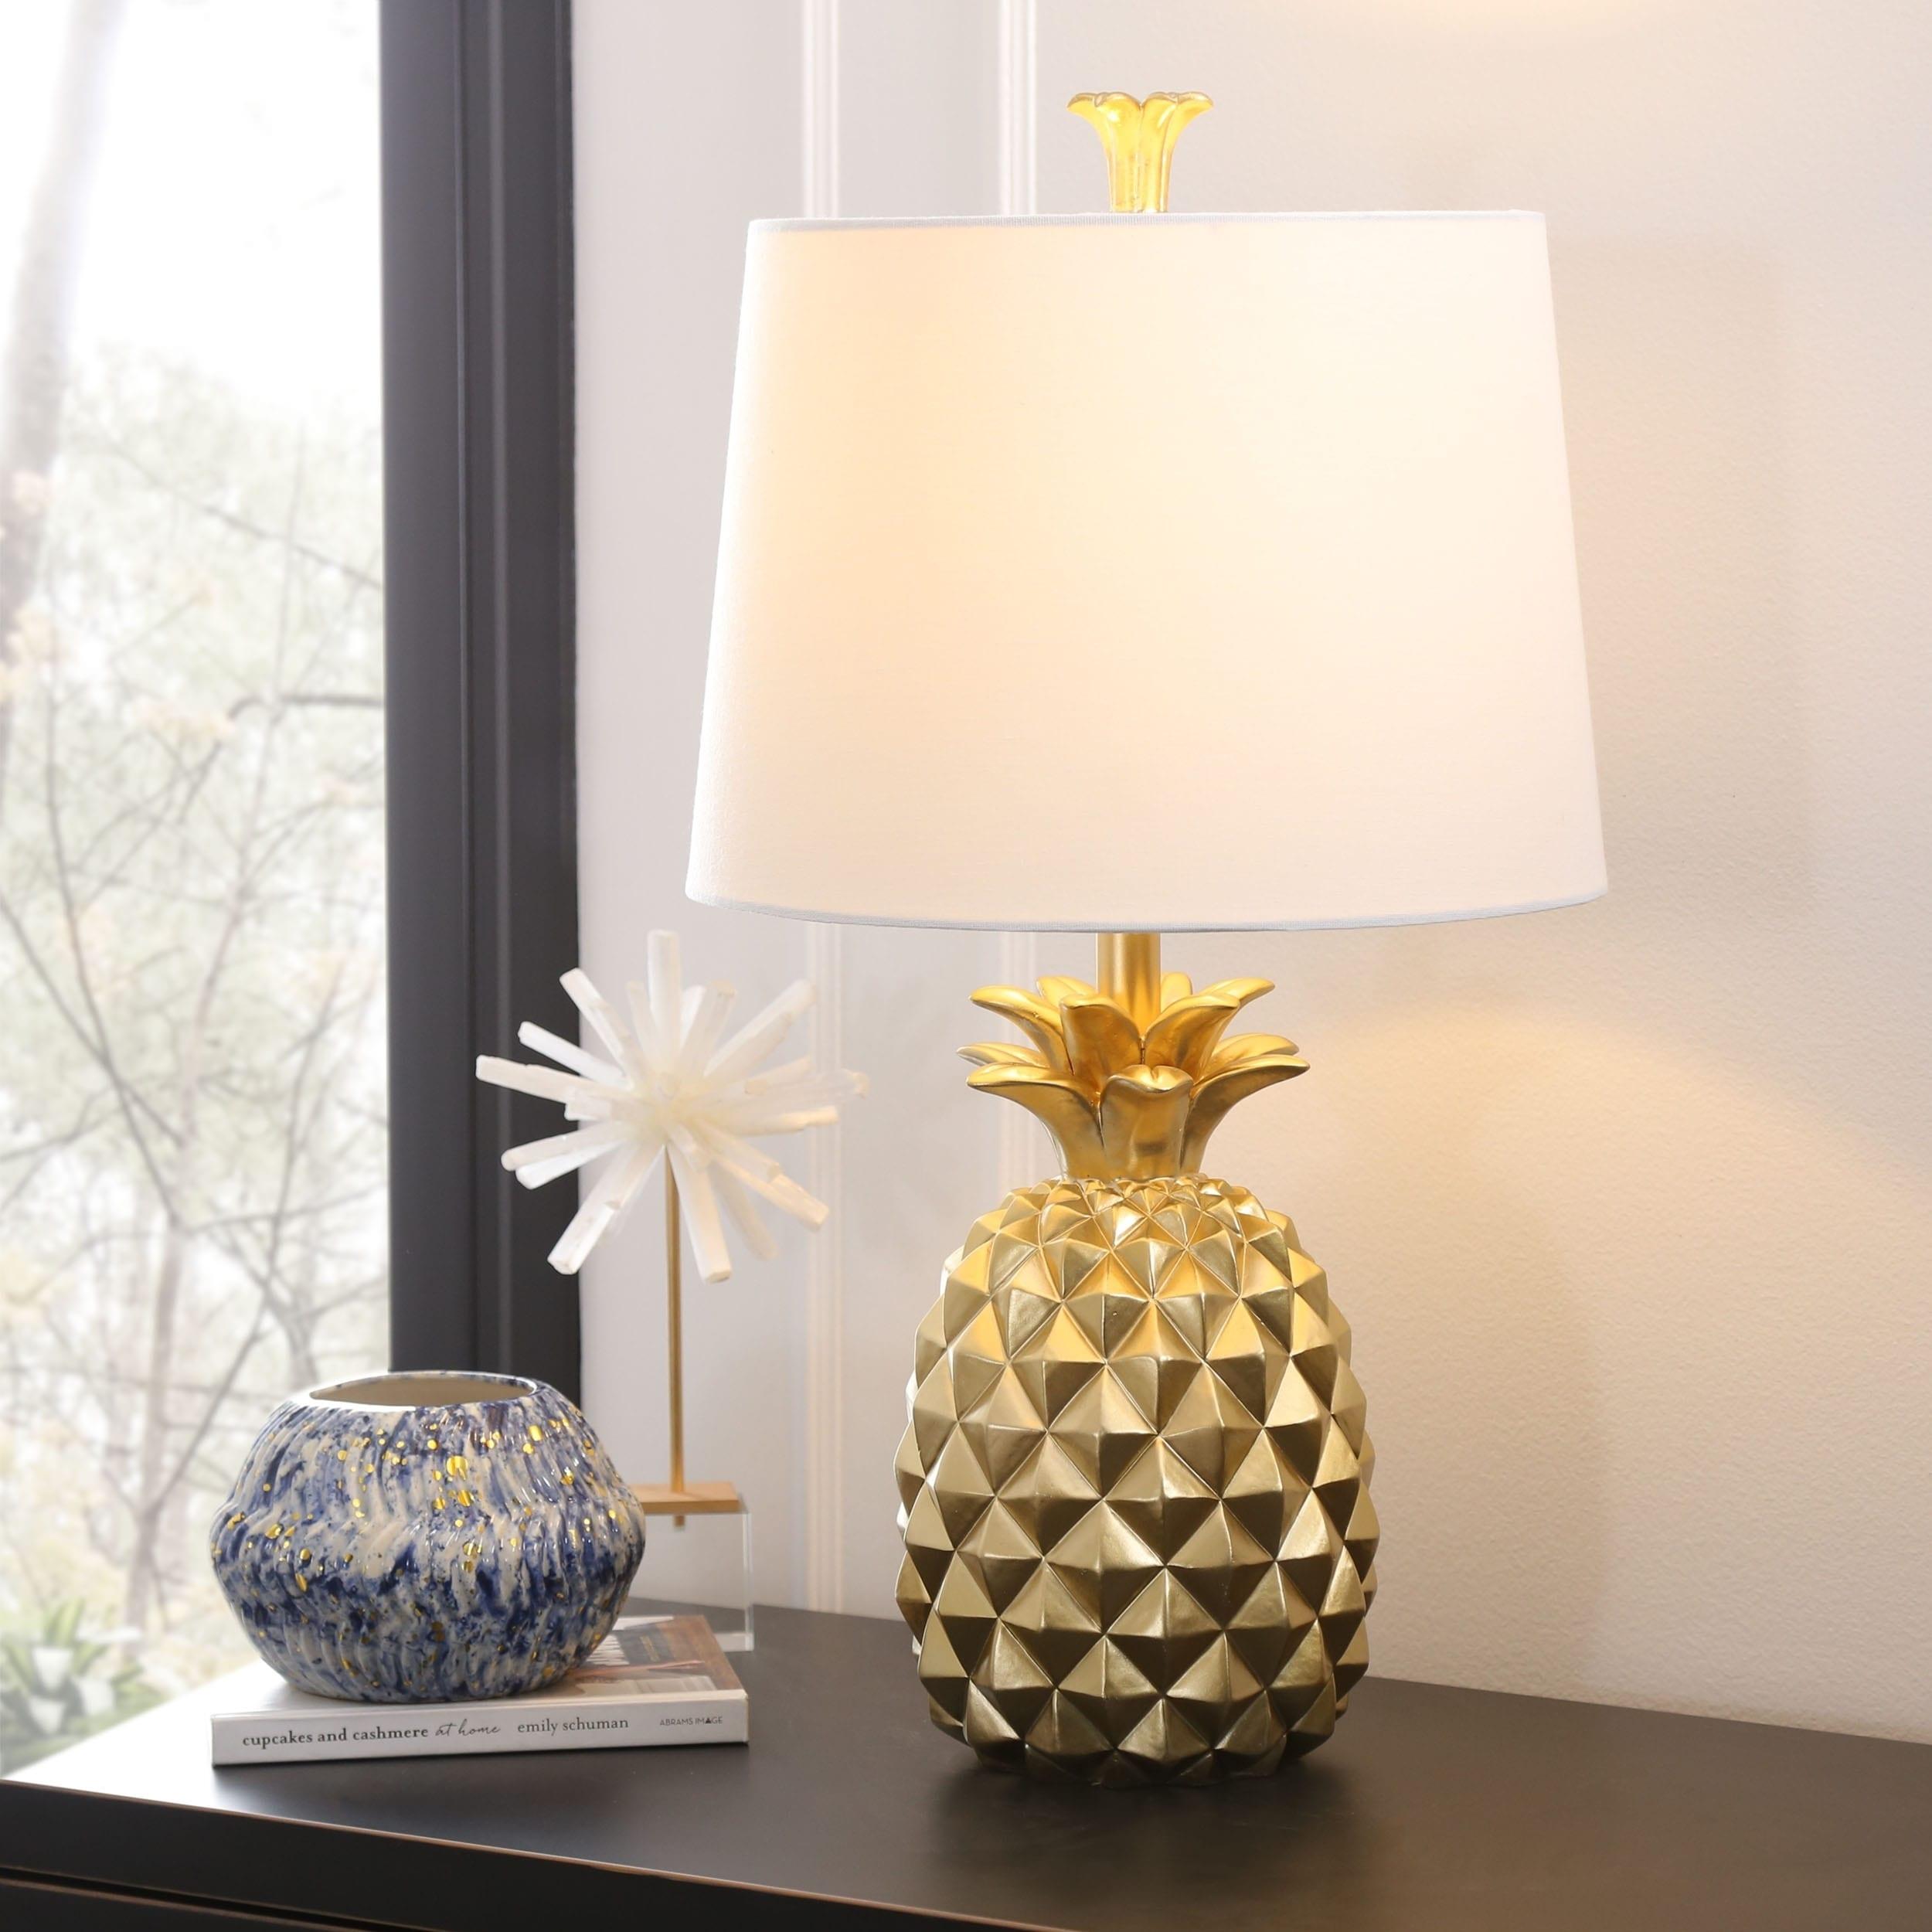 Abbyson Carina 25 Inch Gold Pineapple Table Lamp